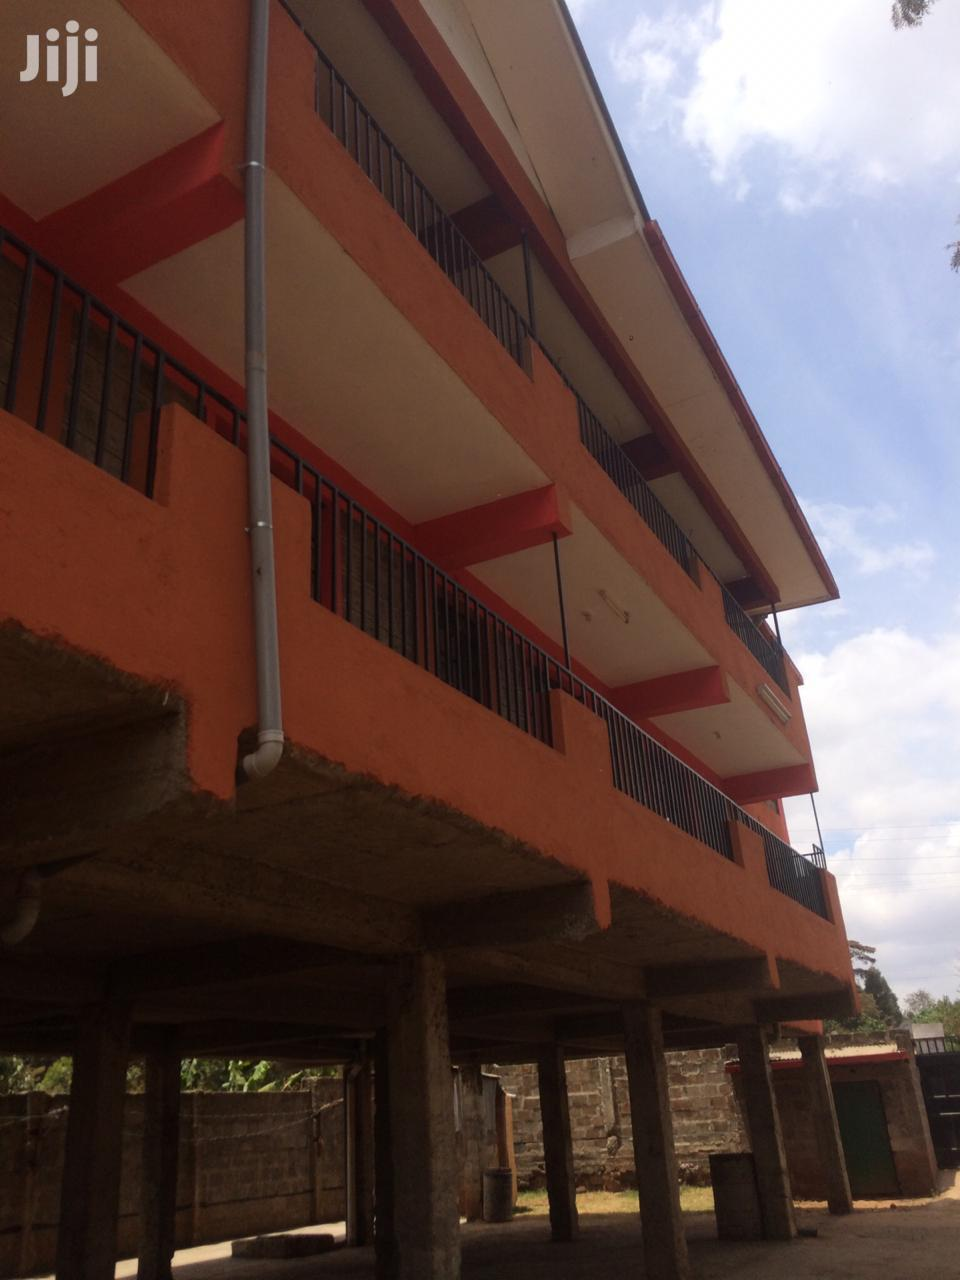 Kitisuru One Bedroom To Let | Houses & Apartments For Rent for sale in Kitisuru, Nairobi, Kenya